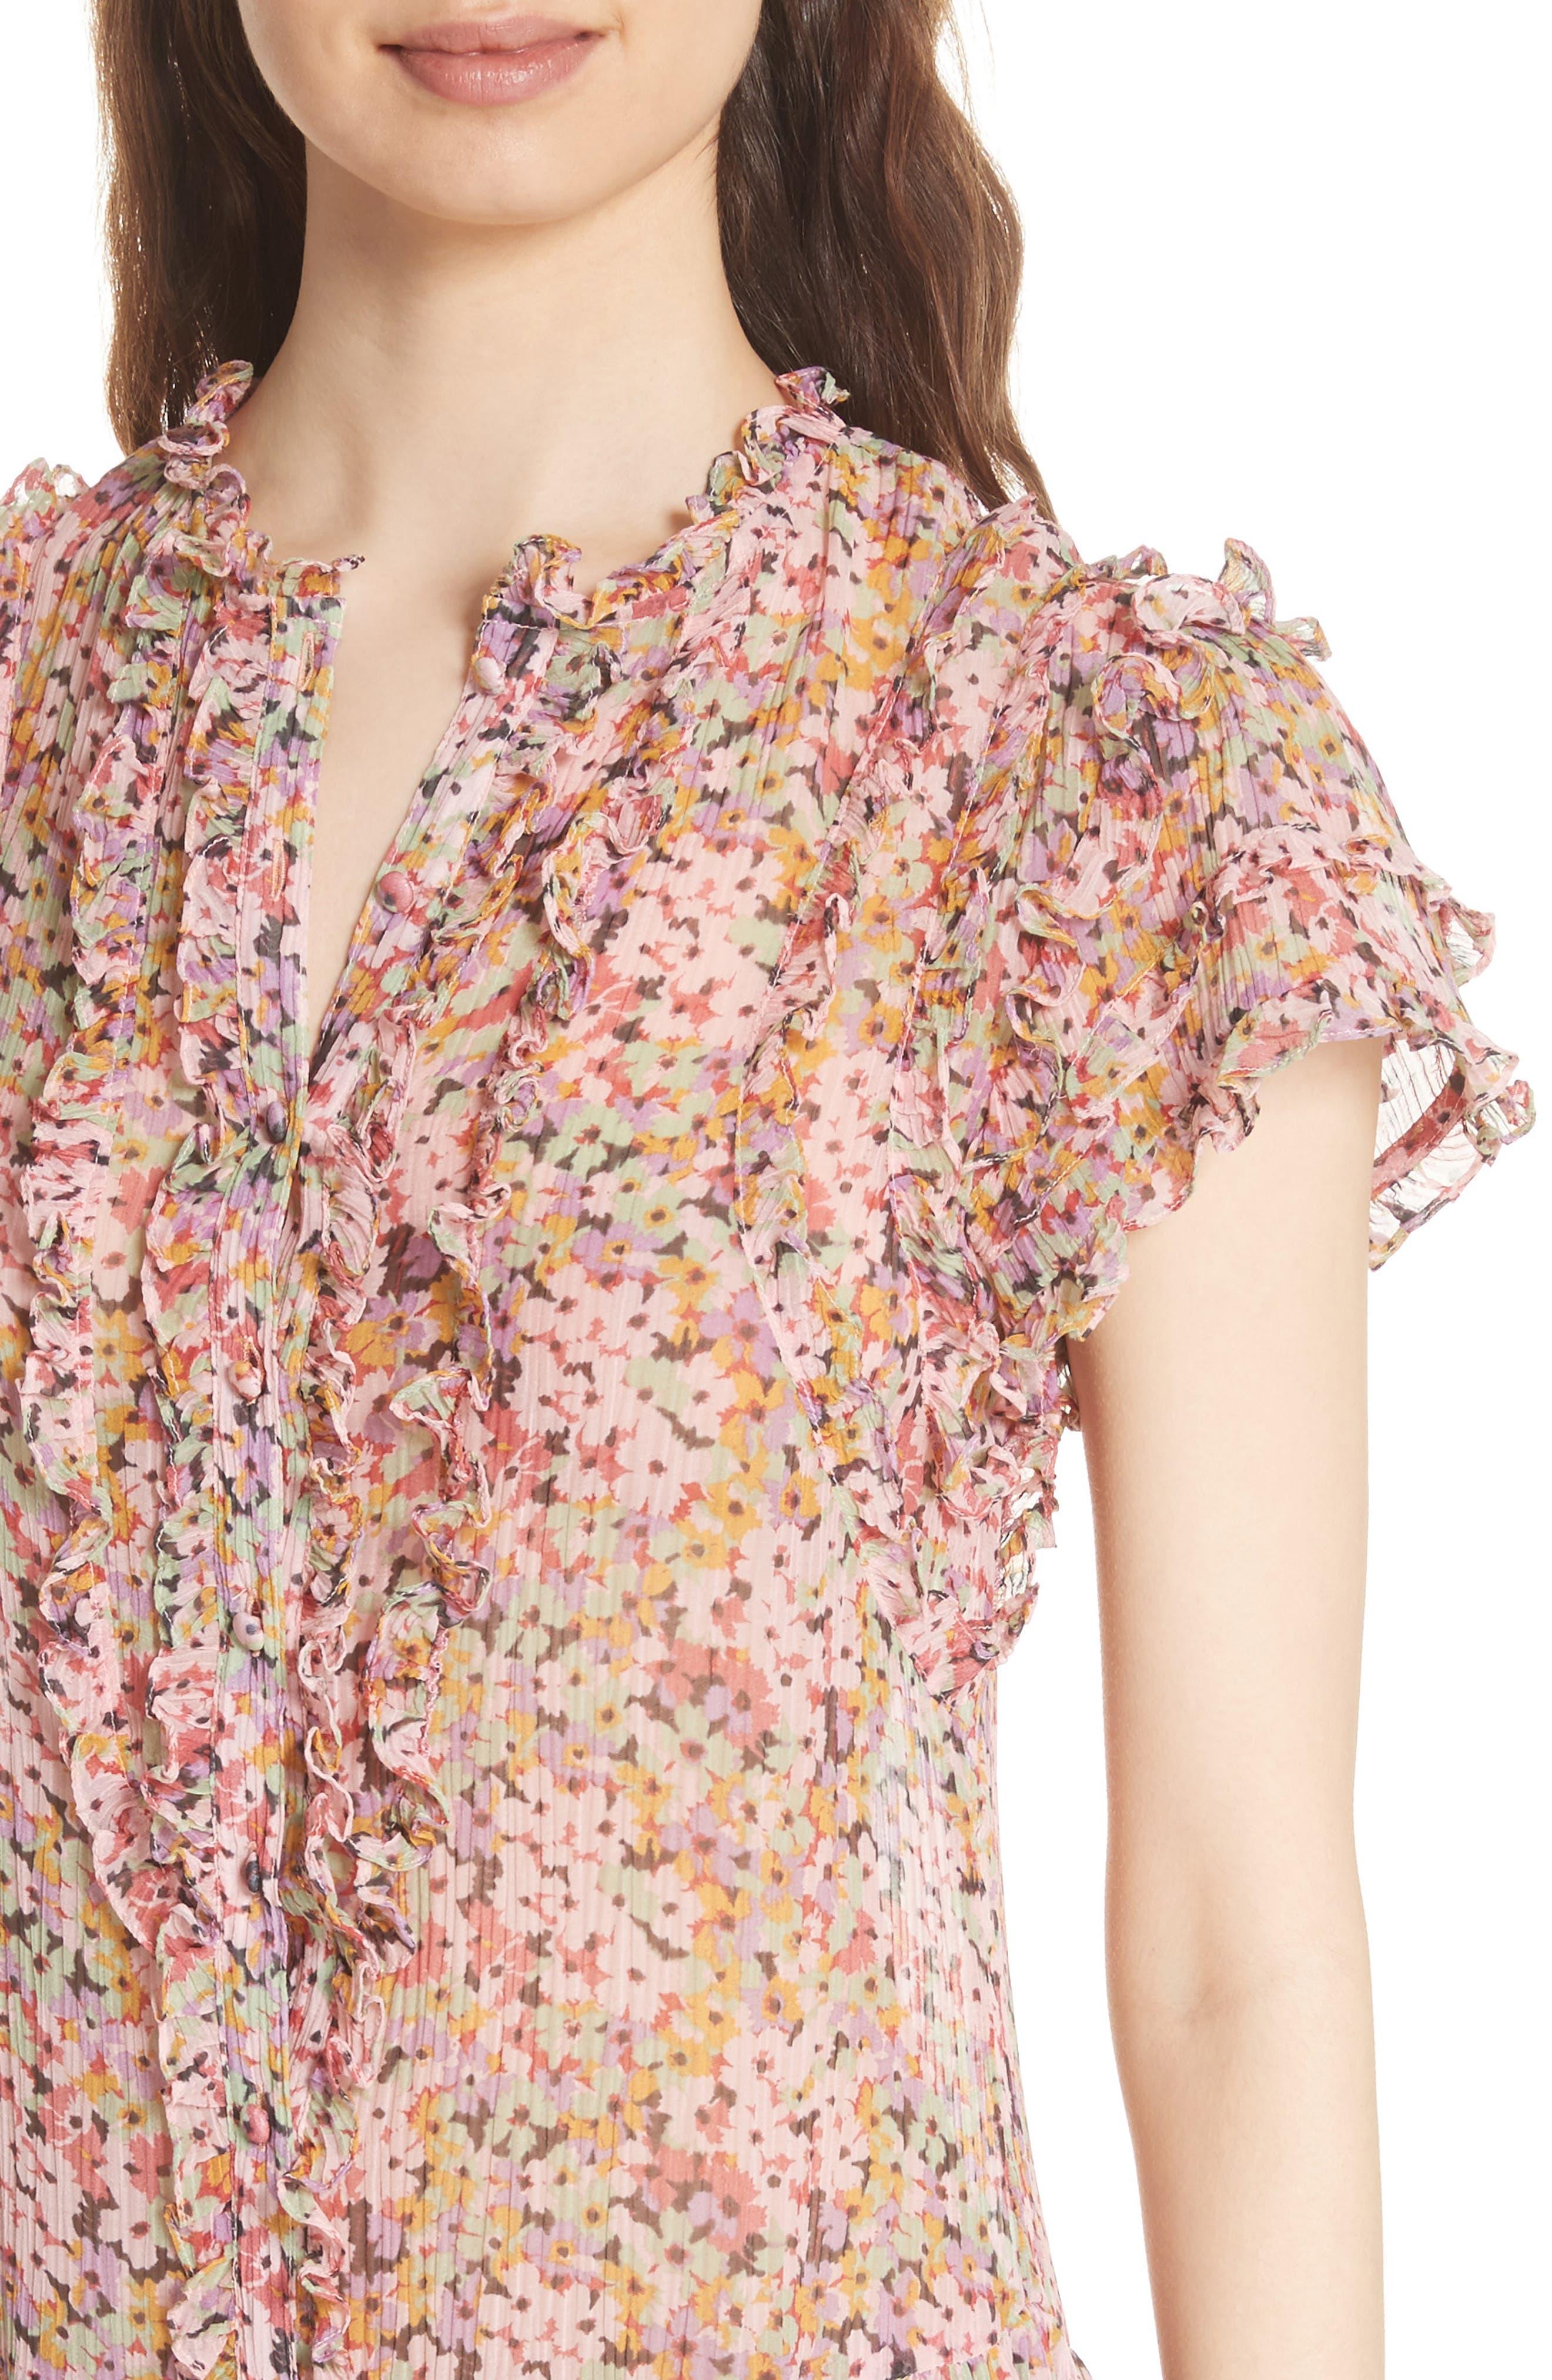 Margo Ruffled Floral Drop Waist Dress,                             Alternate thumbnail 4, color,                             686